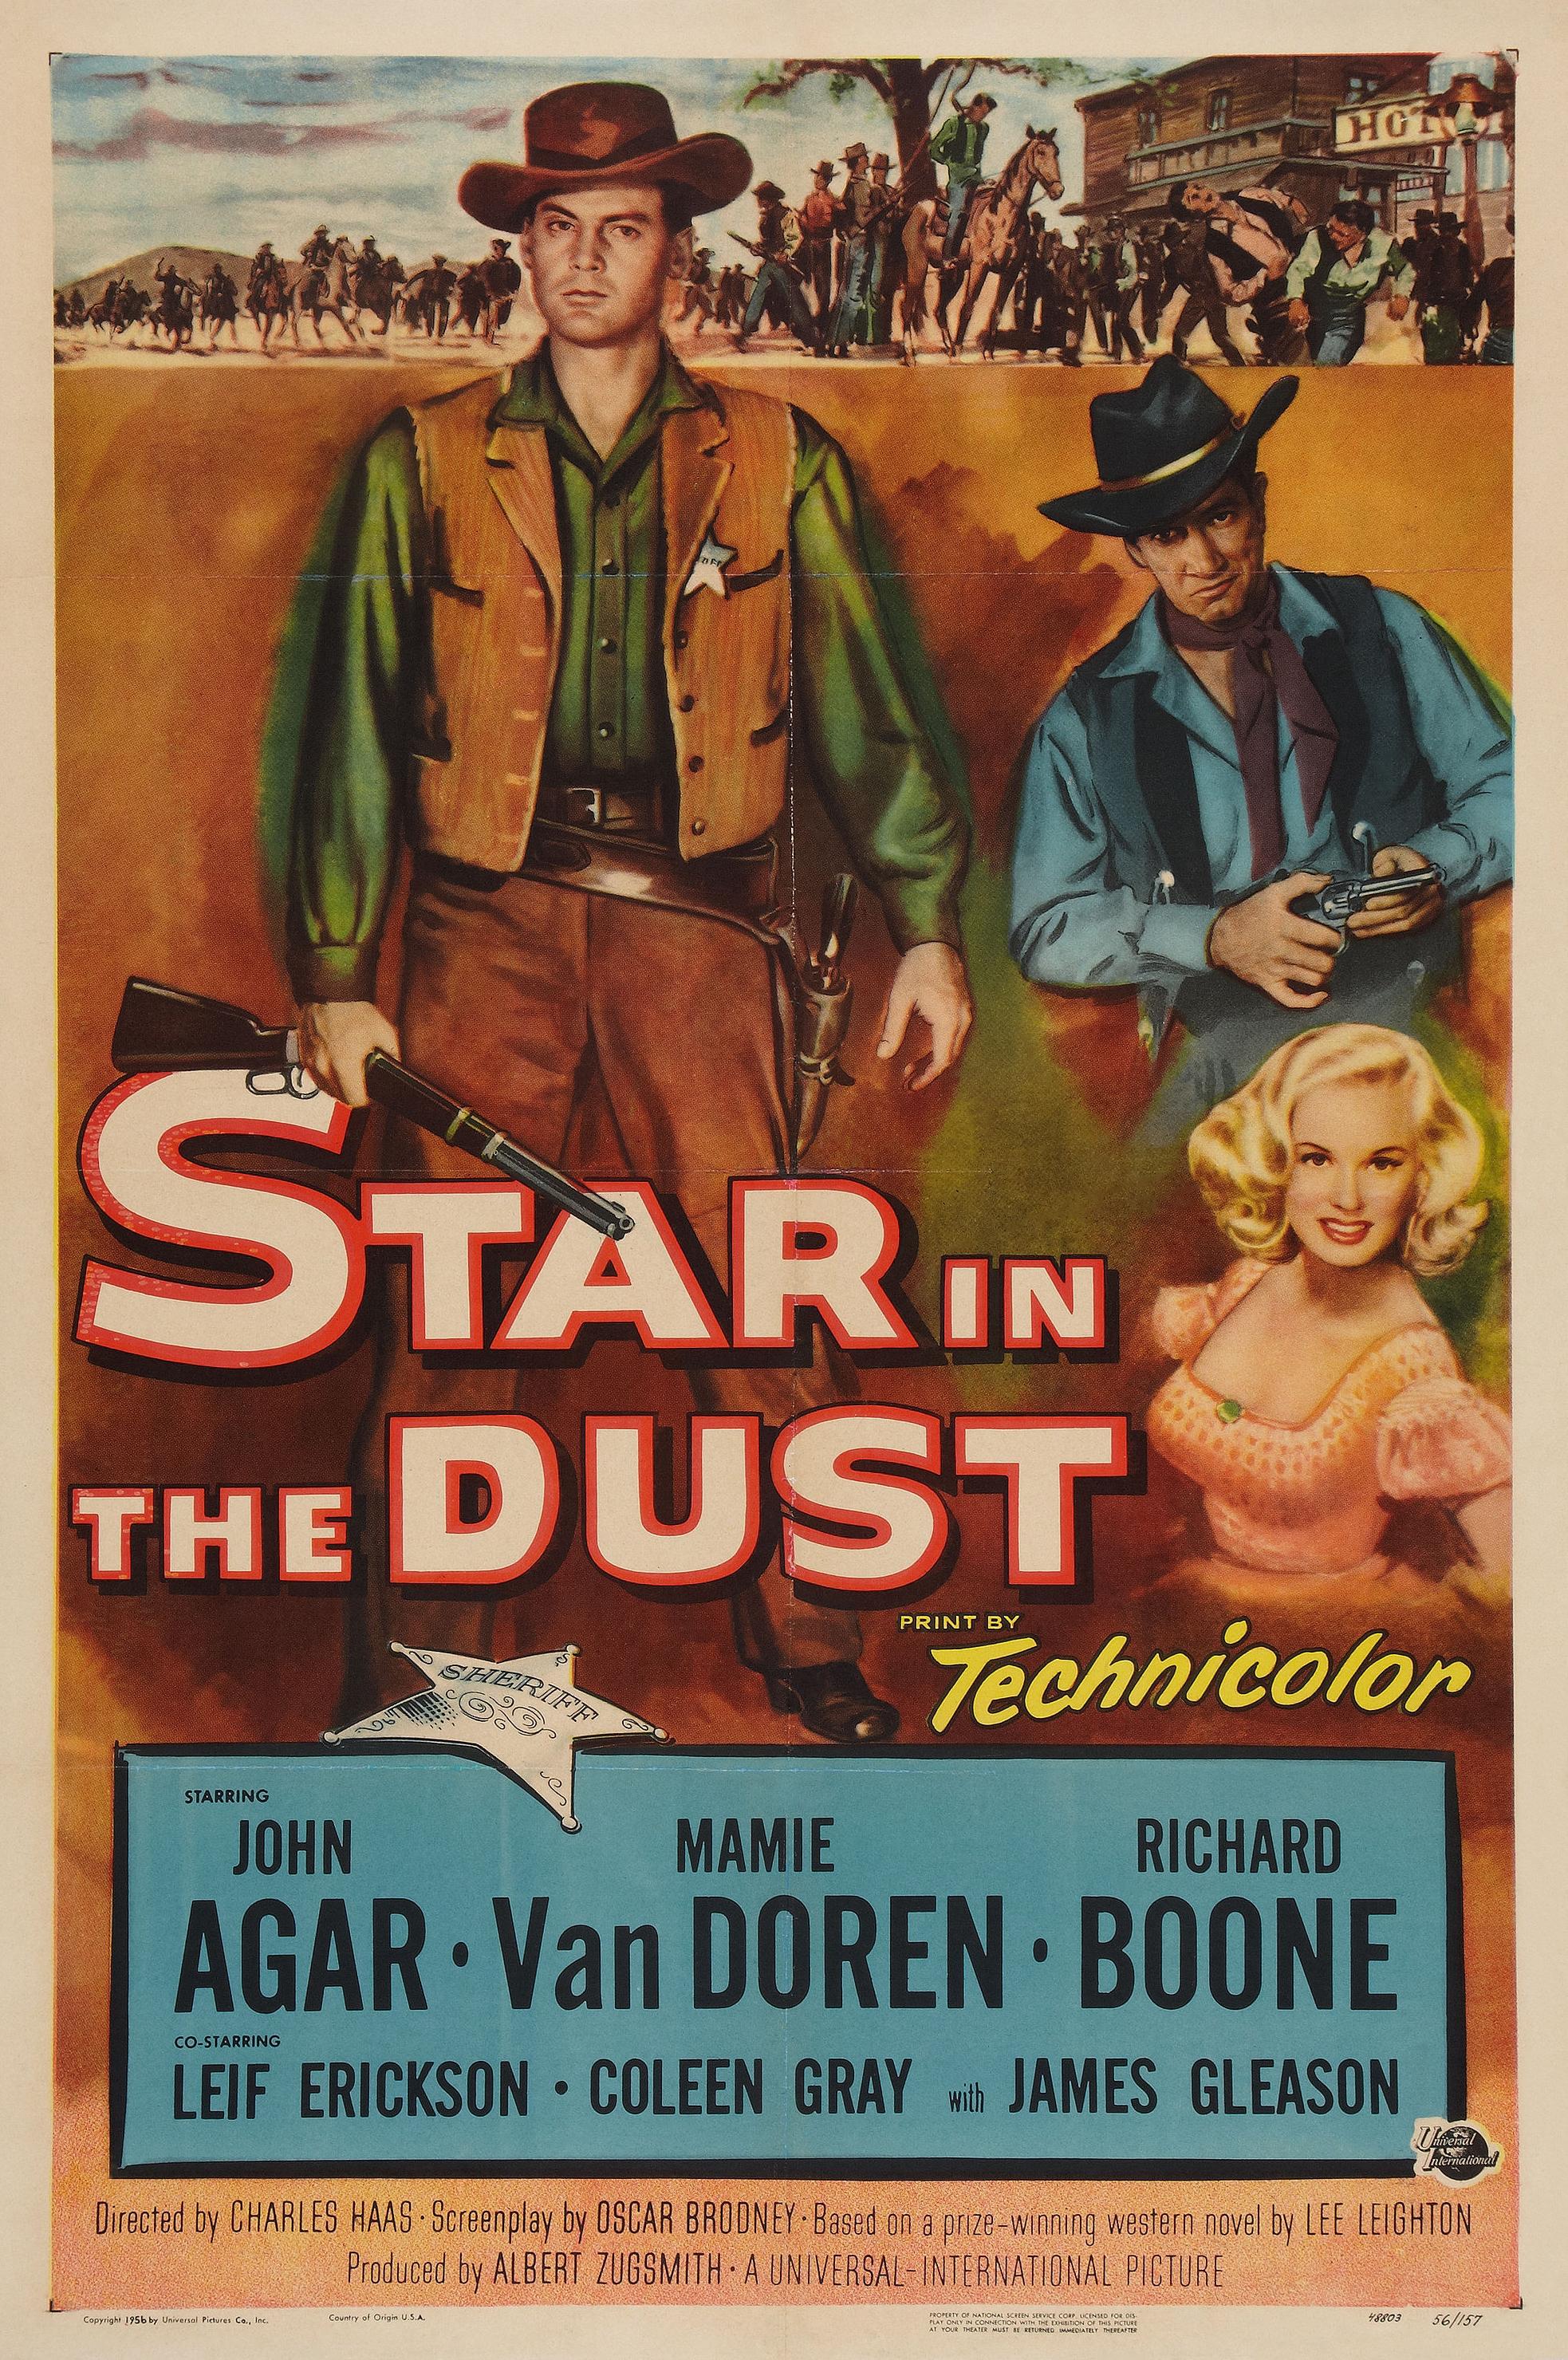 John Agar, Richard Boone, and Mamie Van Doren in Star in the Dust (1956)